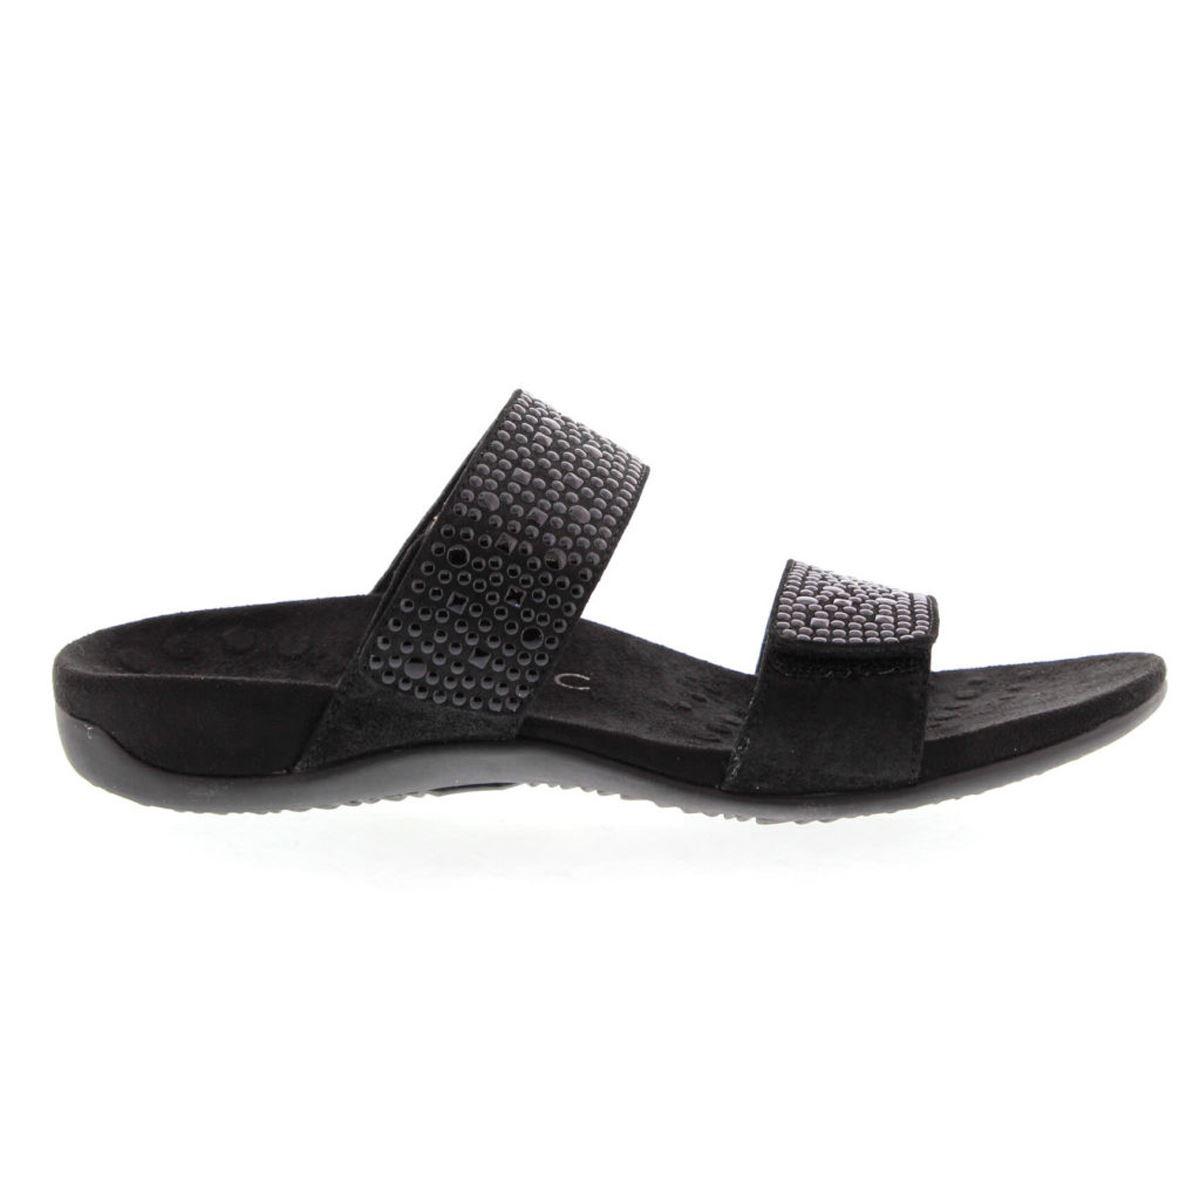 Samoa Details 341 About Womens Vionic Rest Black Sandals 7gy6YbvIfm